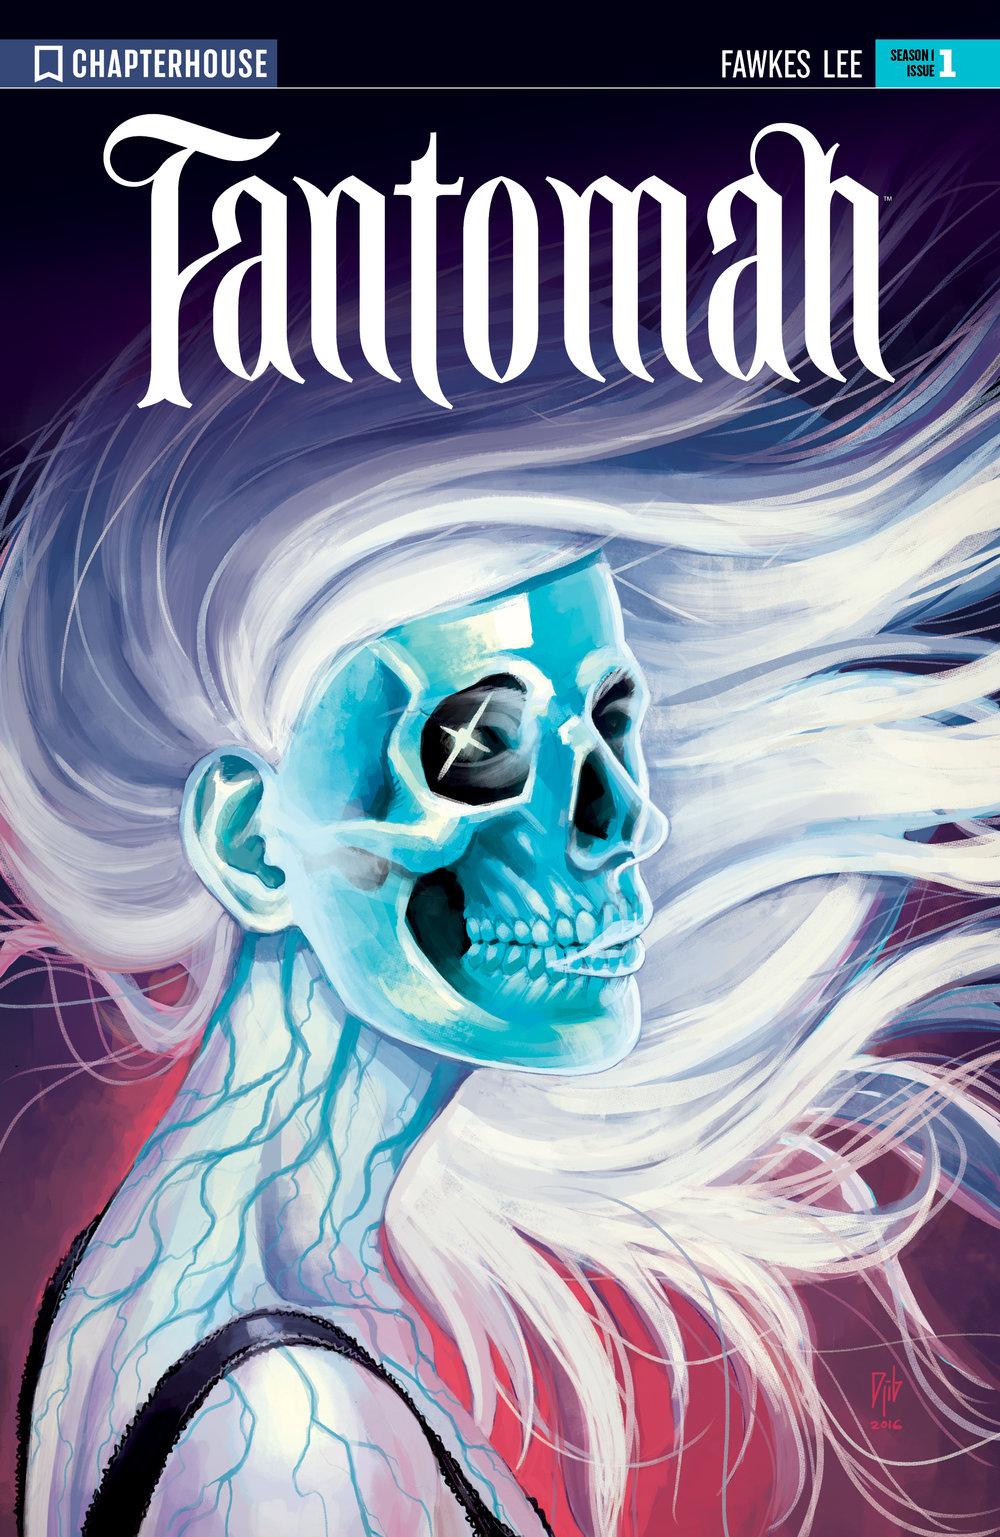 Fantomah-S1#1_RGB-d.jpg